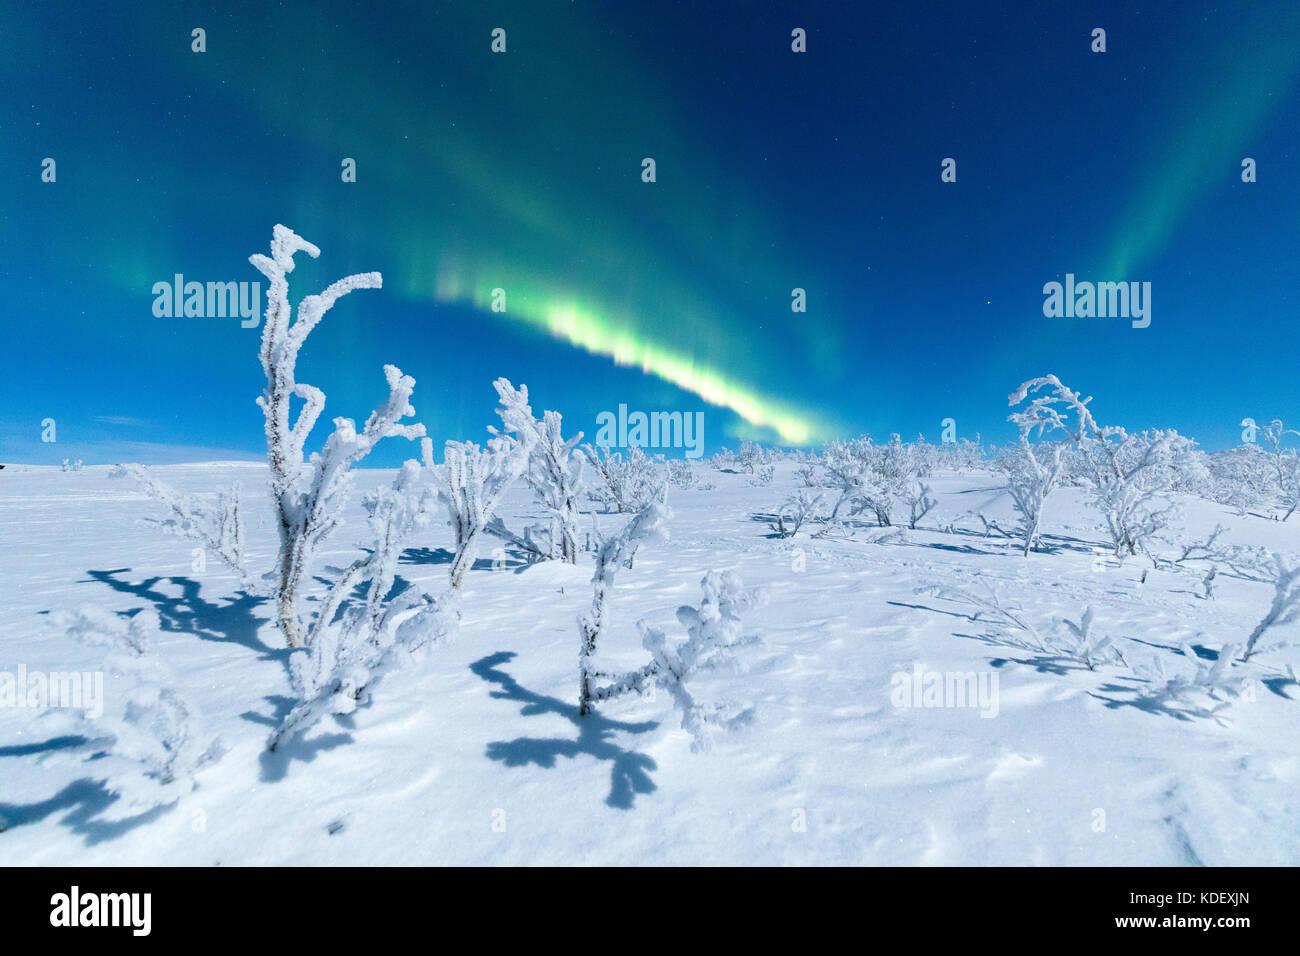 Northern Lights on frozen trees, Abisko,  Kiruna Municipality, Norrbotten County, Lapland, Sweden - Stock Image